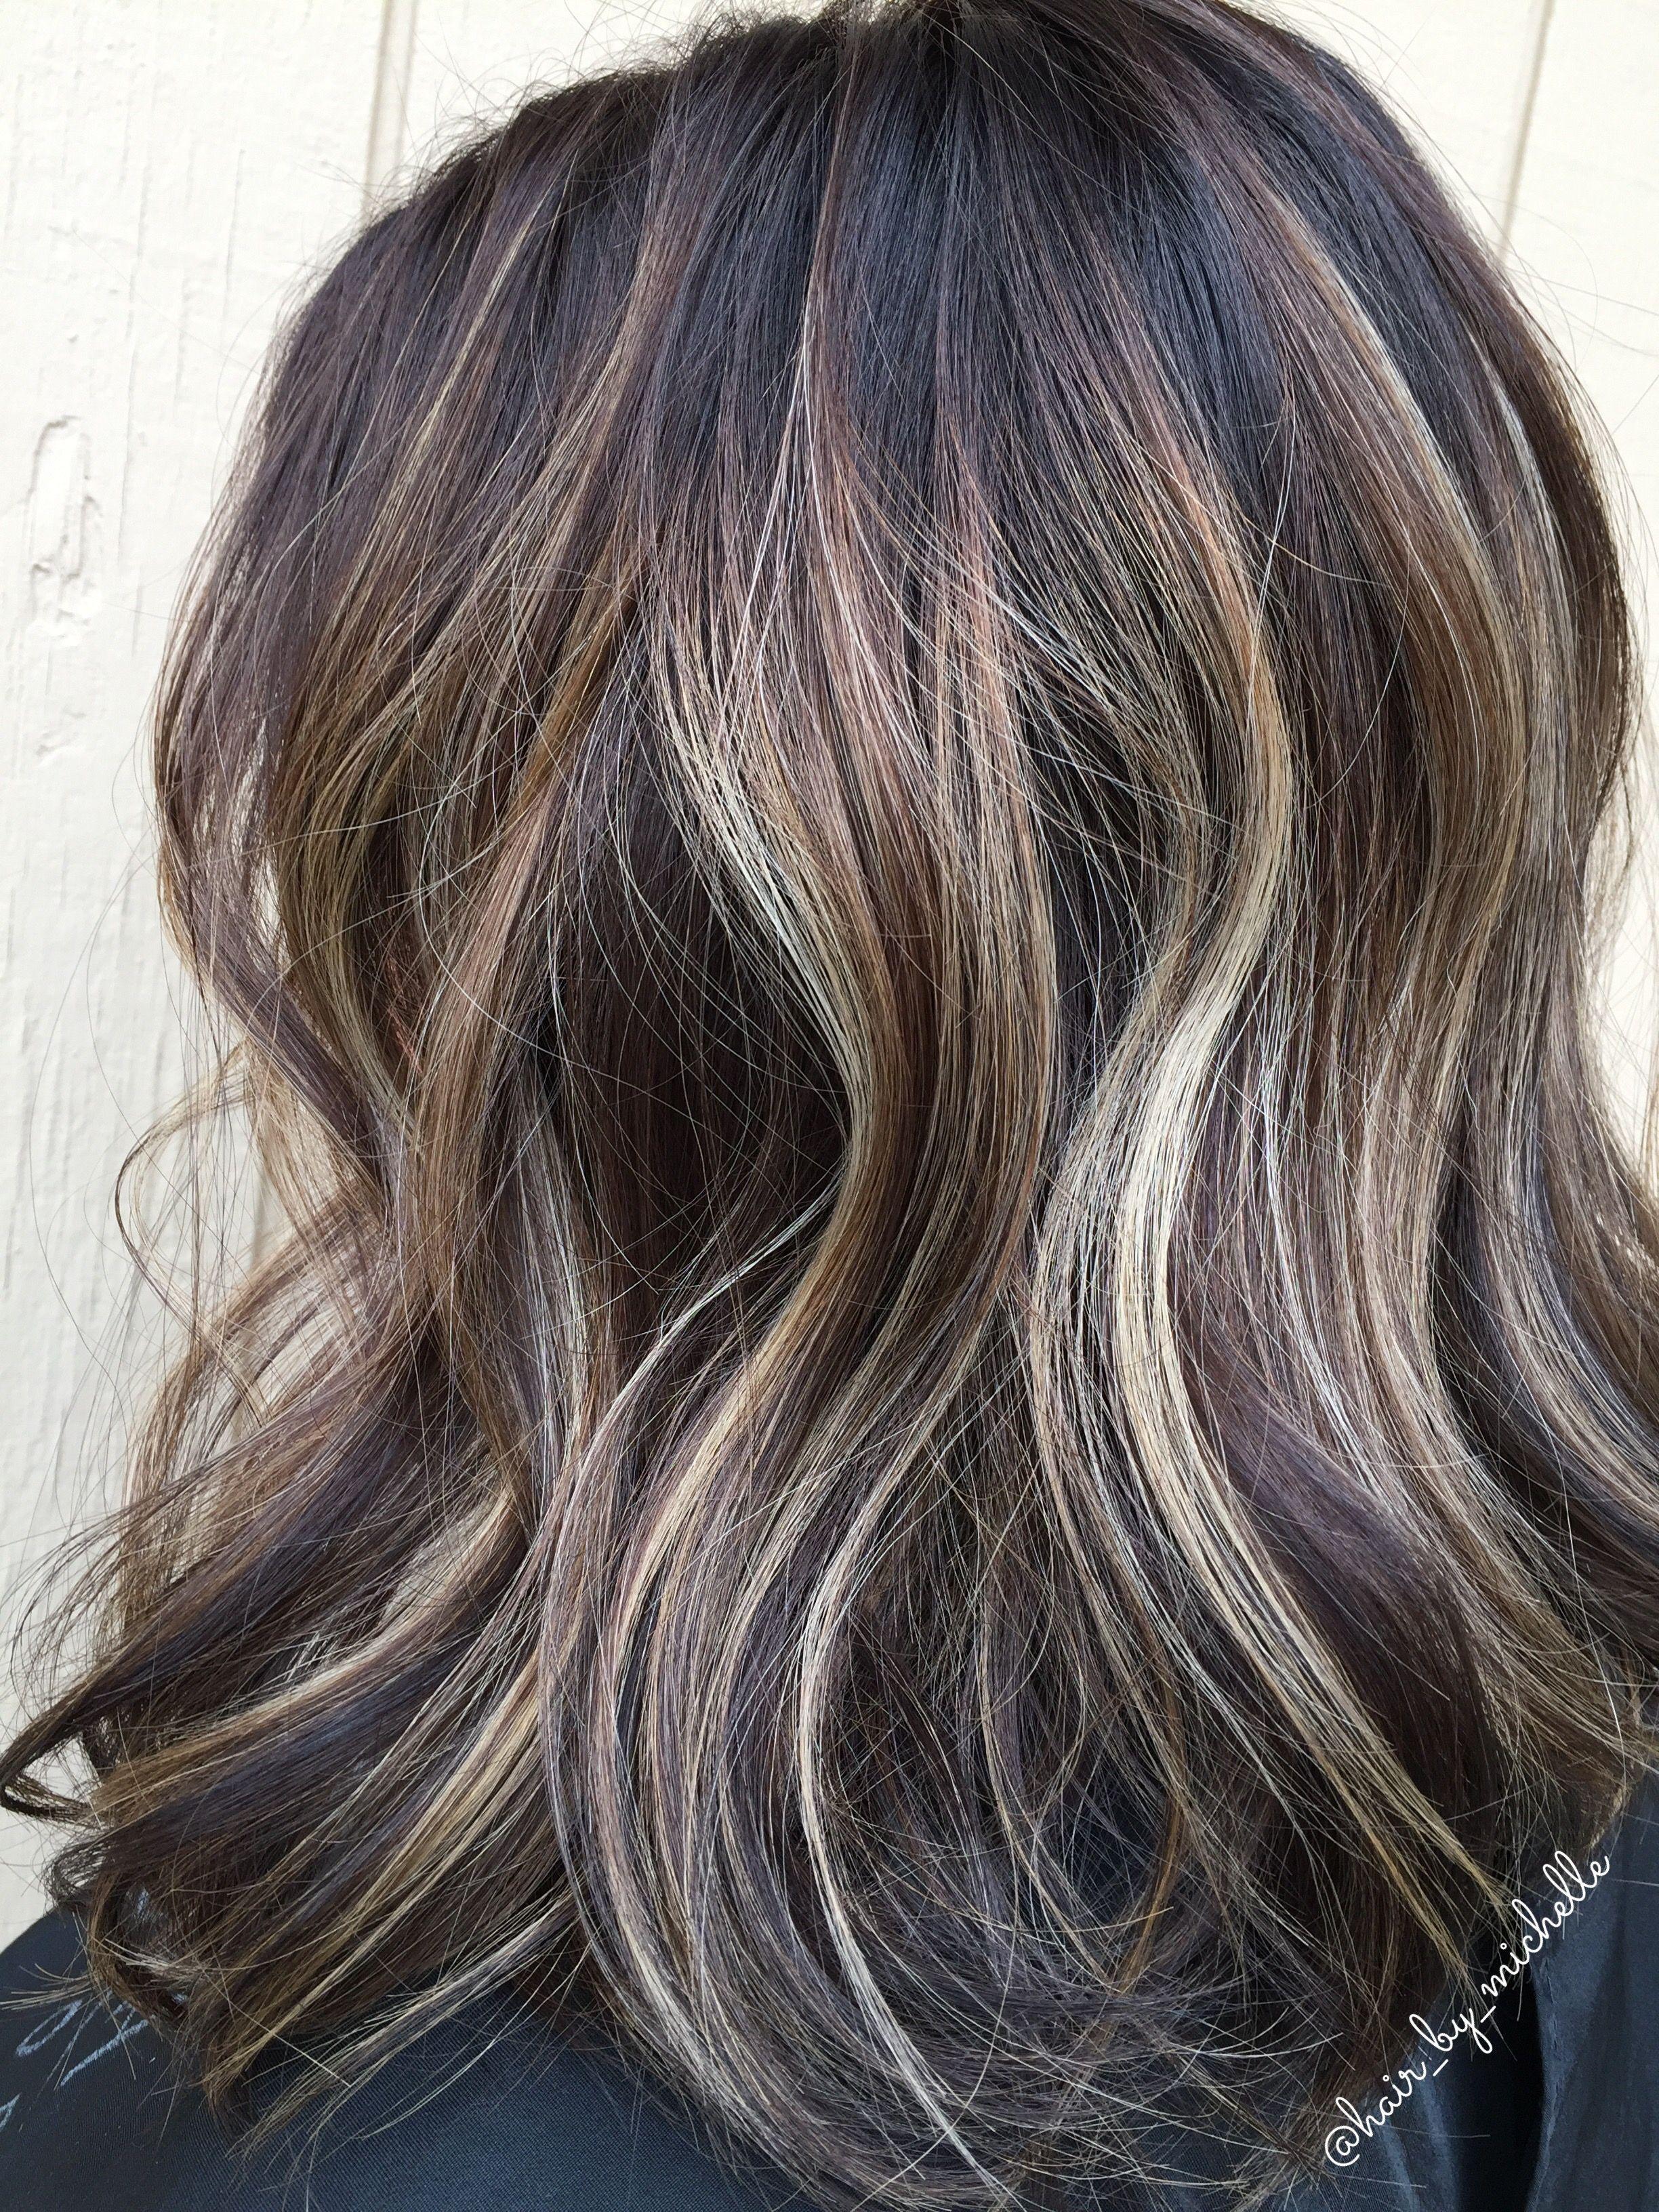 Dark Hair Balayage Brunette Highlights On Dark Hair Dark